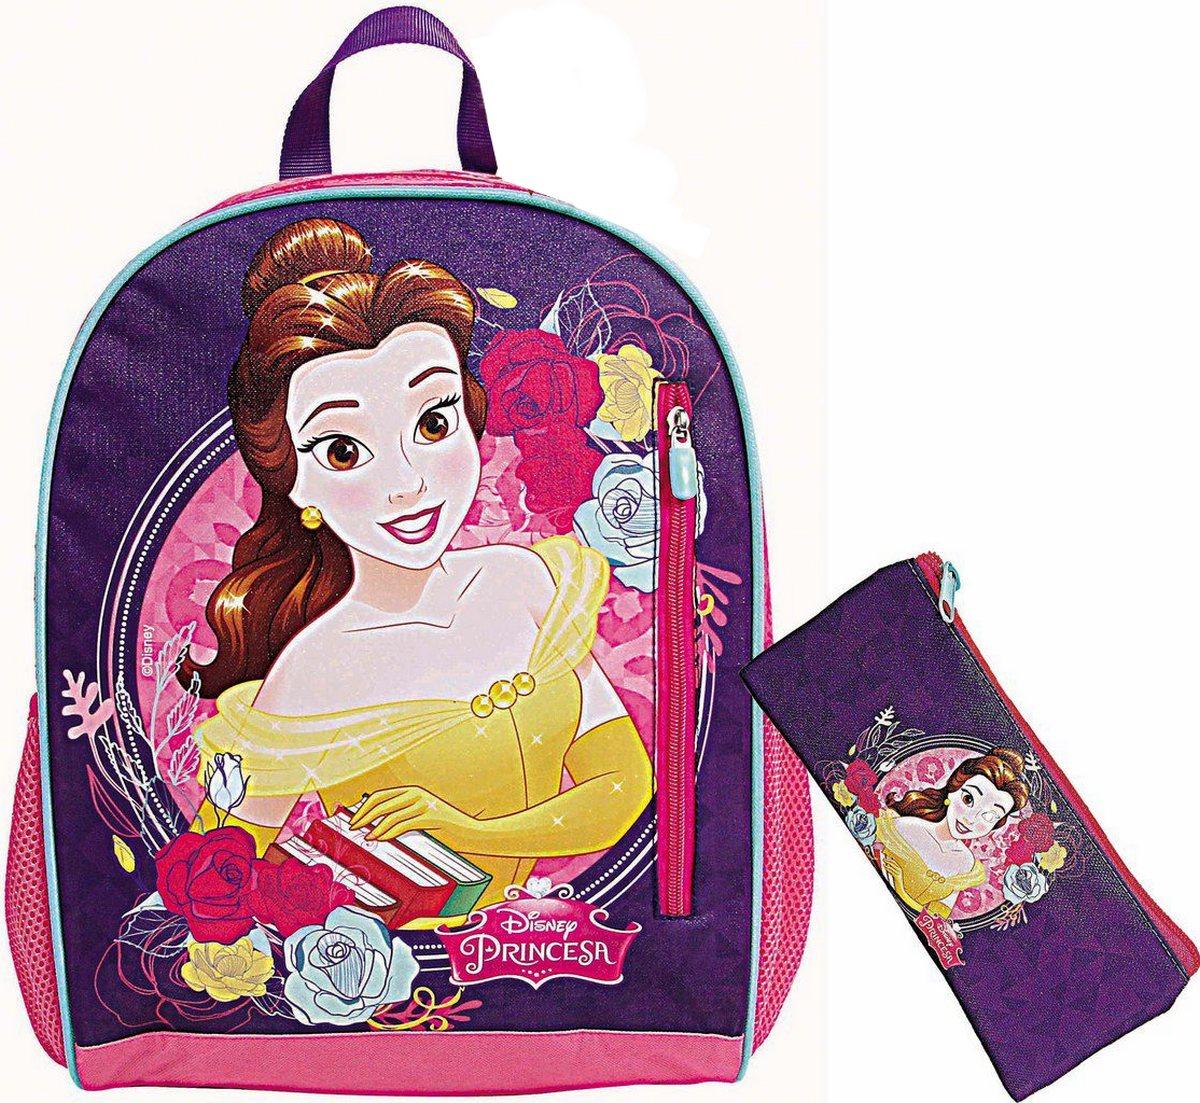 Kit Conjunto Mochila Escolar Infantil Menina Bela E A Fera Glitter Costas Resistente Grande Feminina + Estojo Simples 1 Compartimento Dermiwil